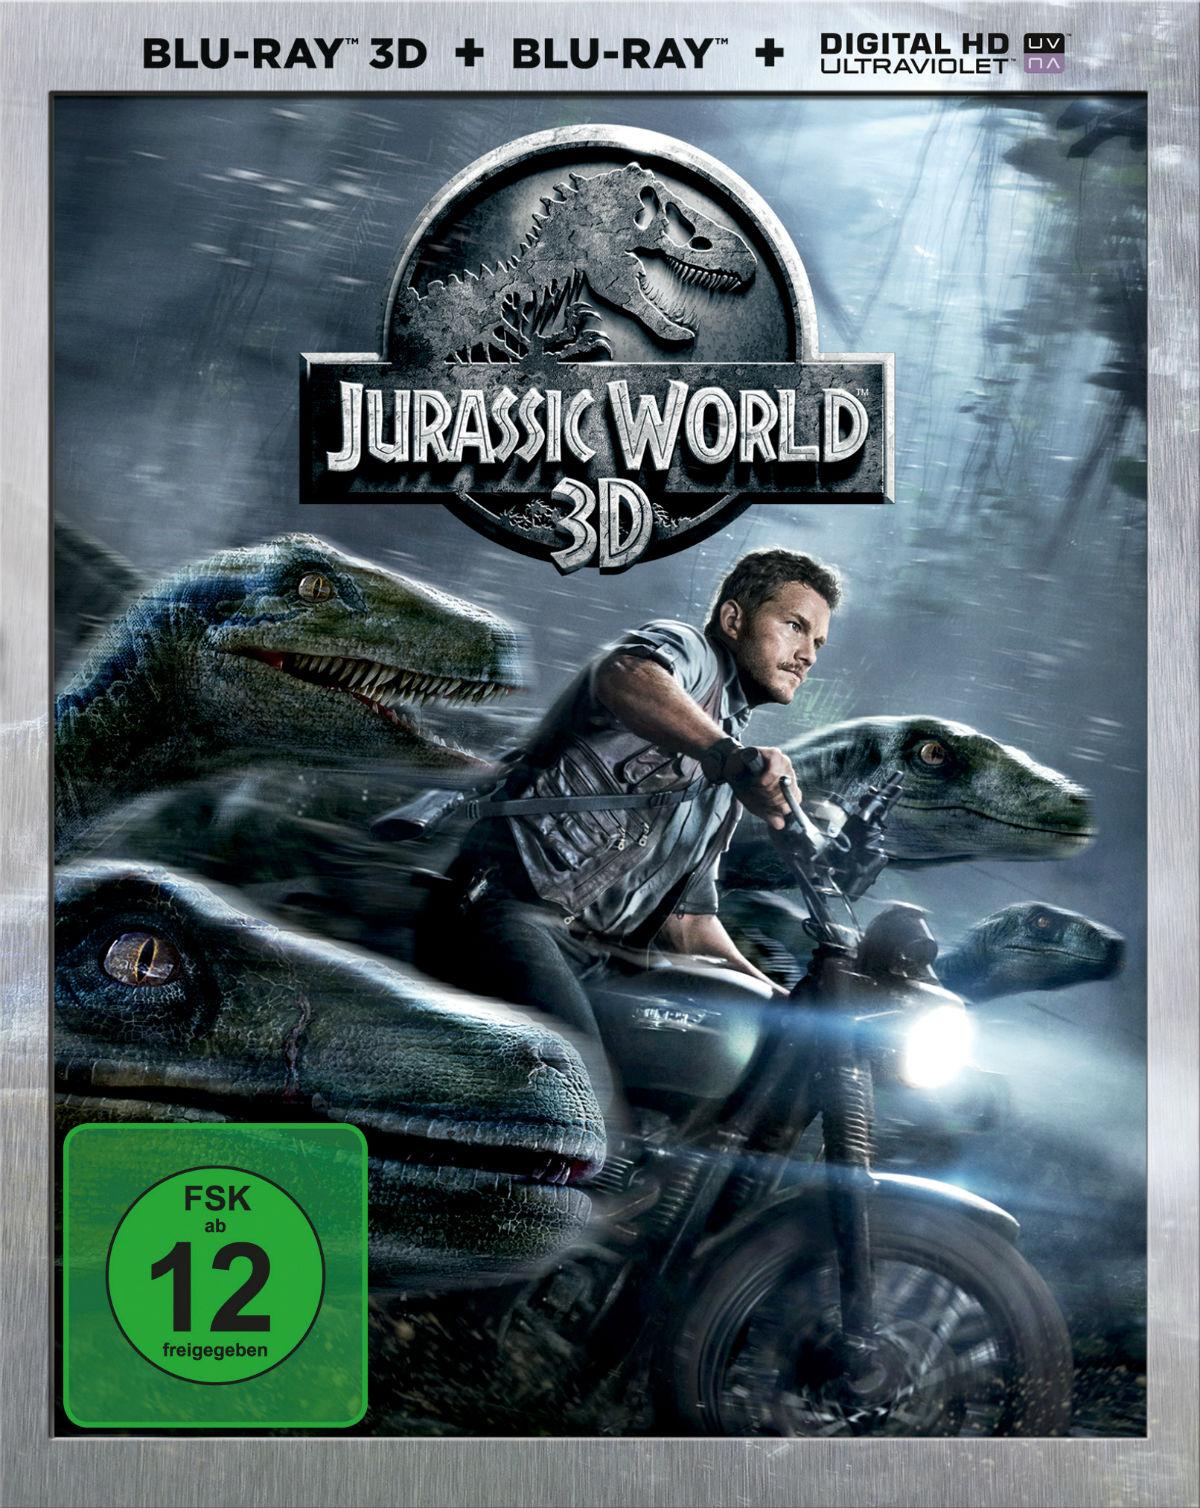 jurassic_world_3d-blu-ray-deutschland-cover-large